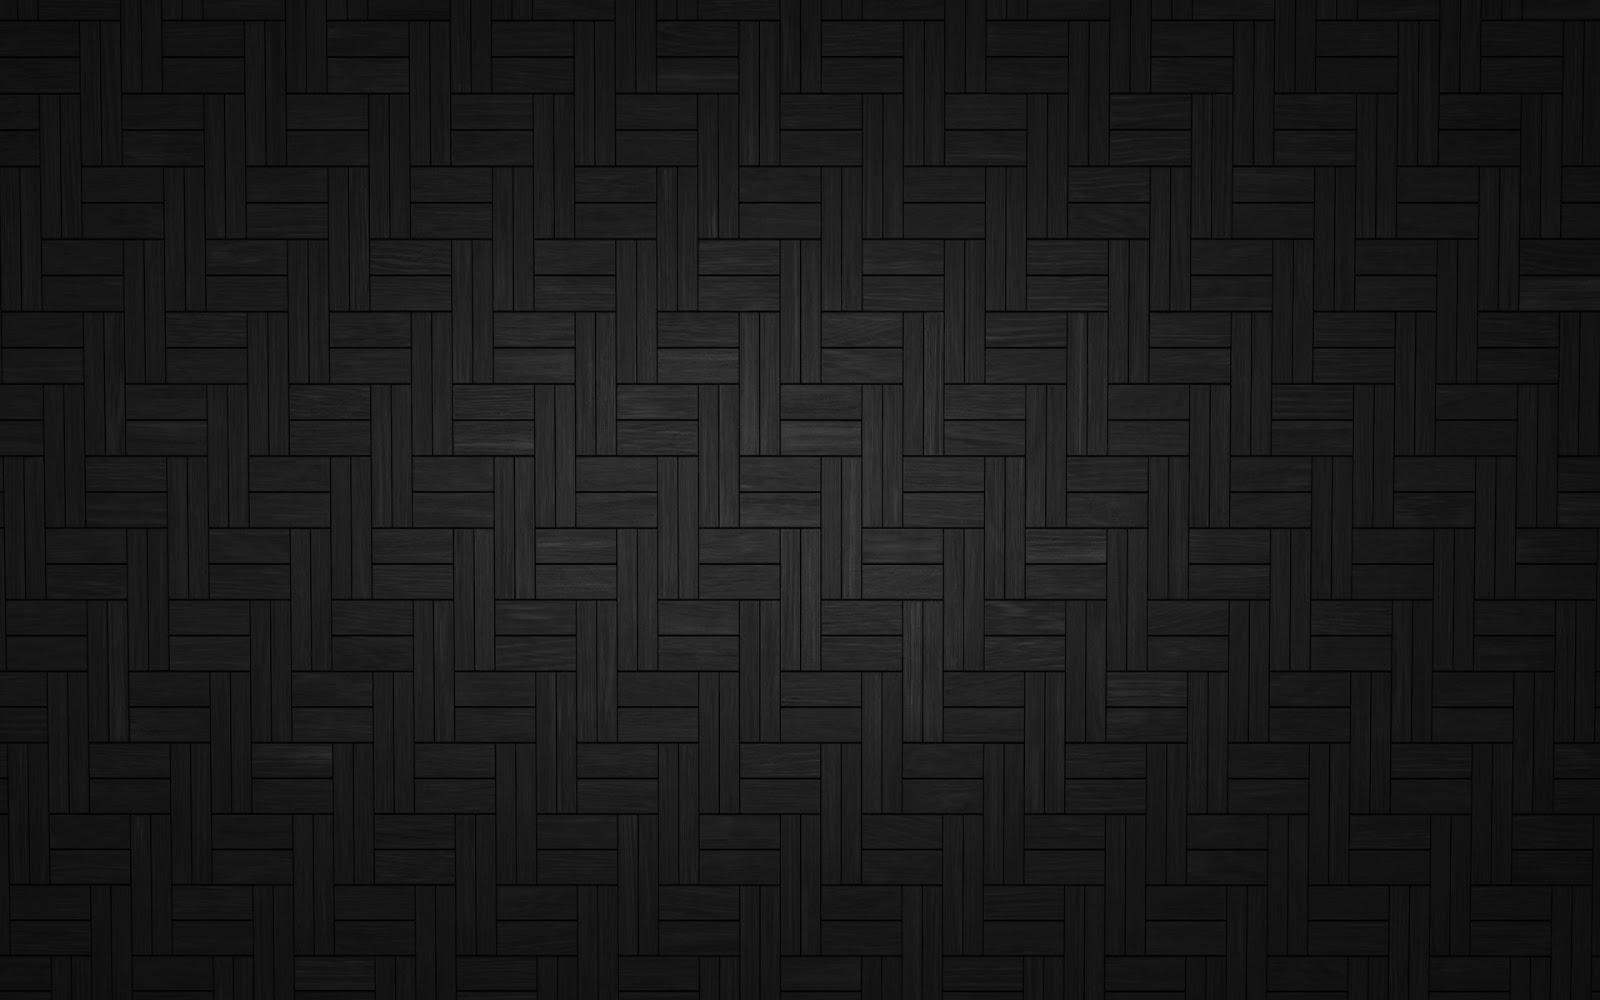 Black Wallpaper Background | Free Download Wallpaper | DaWallpaperz